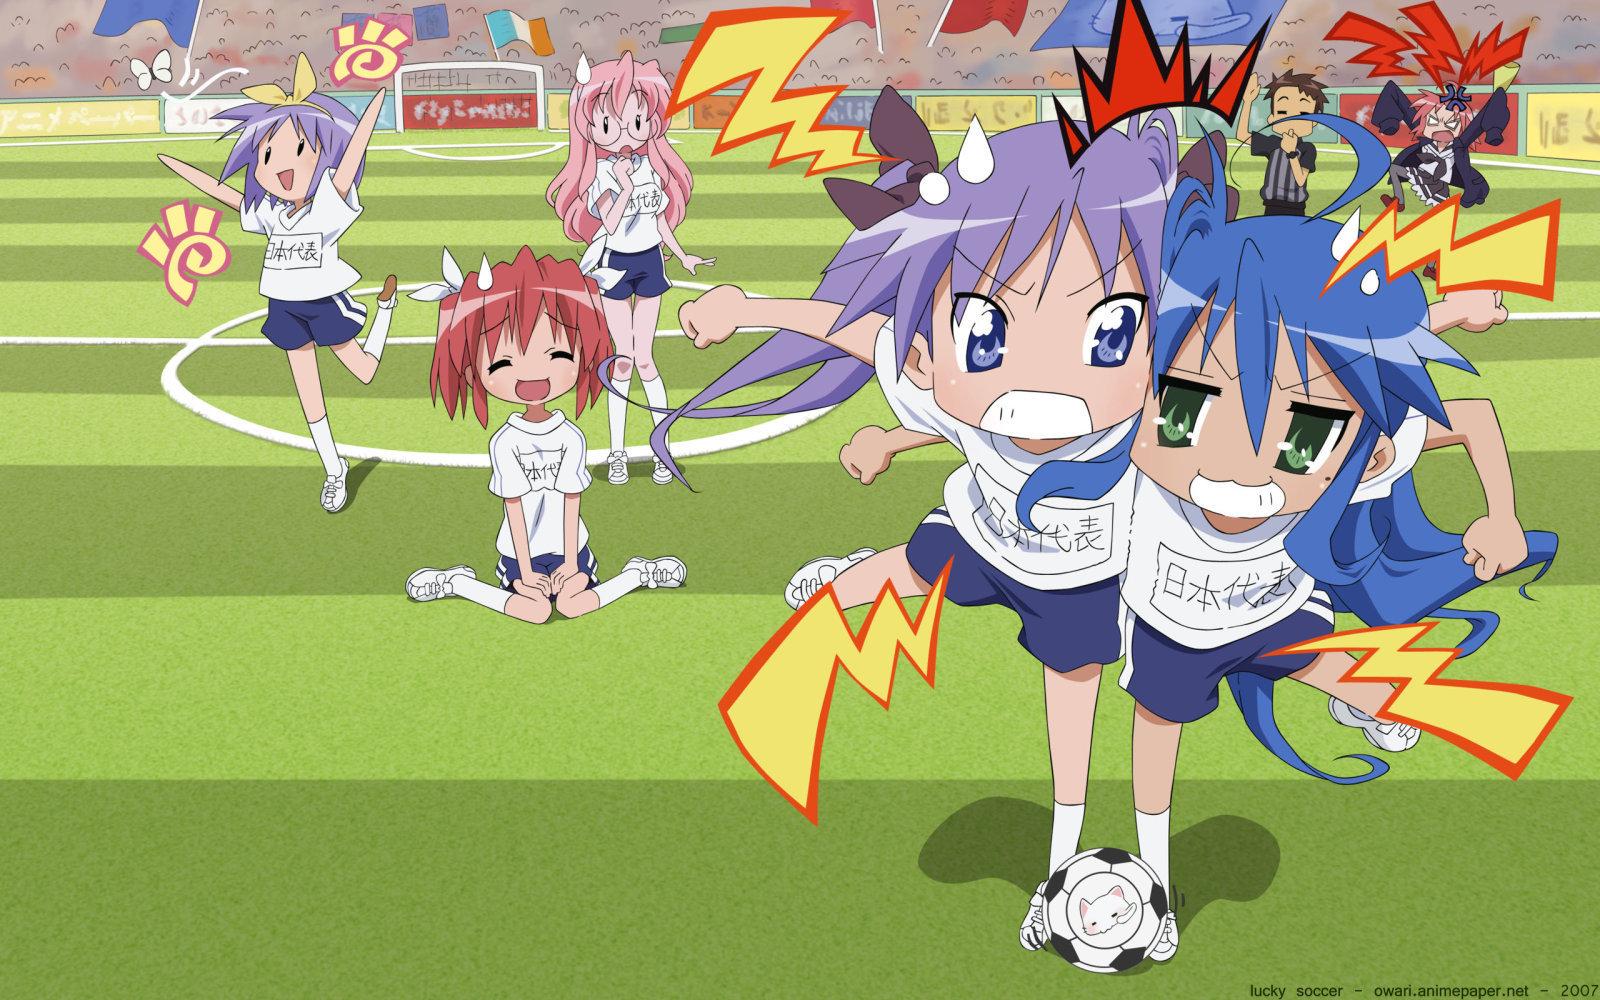 anime_soccer - anime football! Photo (22074022) - Fanpop: www.fanpop.com/clubs/anime-football/images/22074022/title/anime...